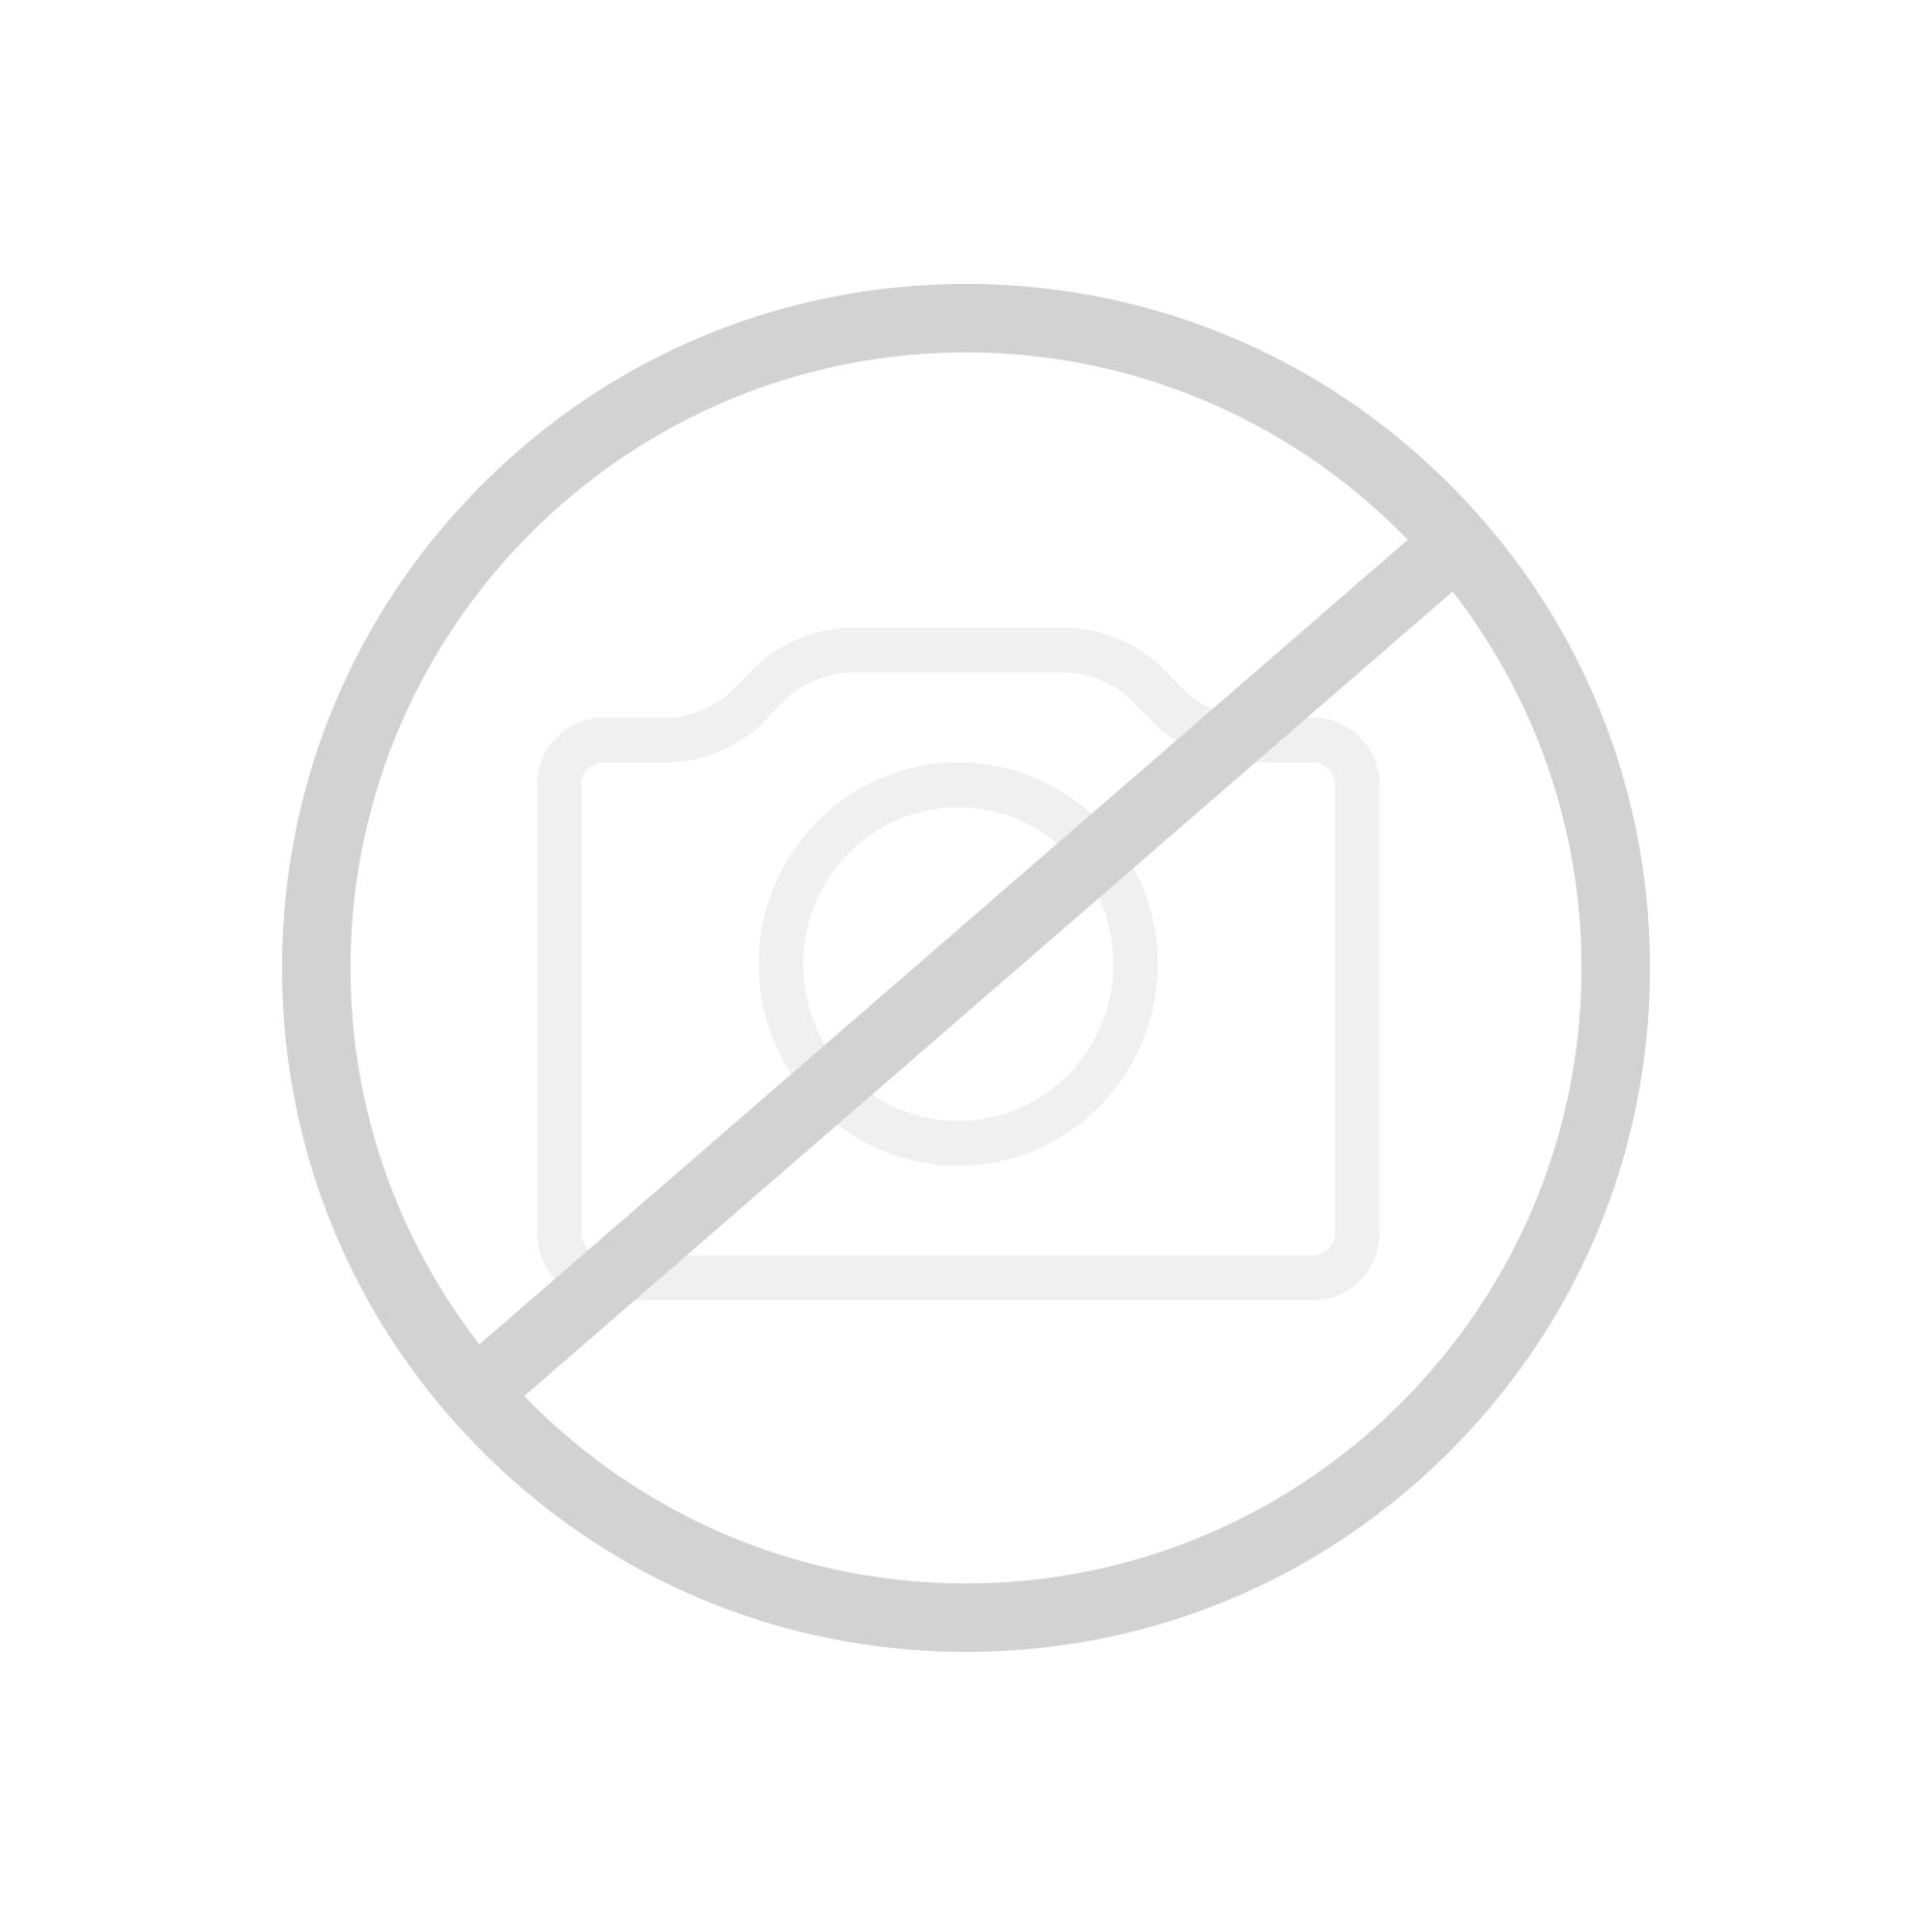 HSK Softcube XS2 Glas-Duschpaneel B: 315 H: 1730 mm mit Kopfbrause B: 400 T: 250 mm Glasfarbe weiß